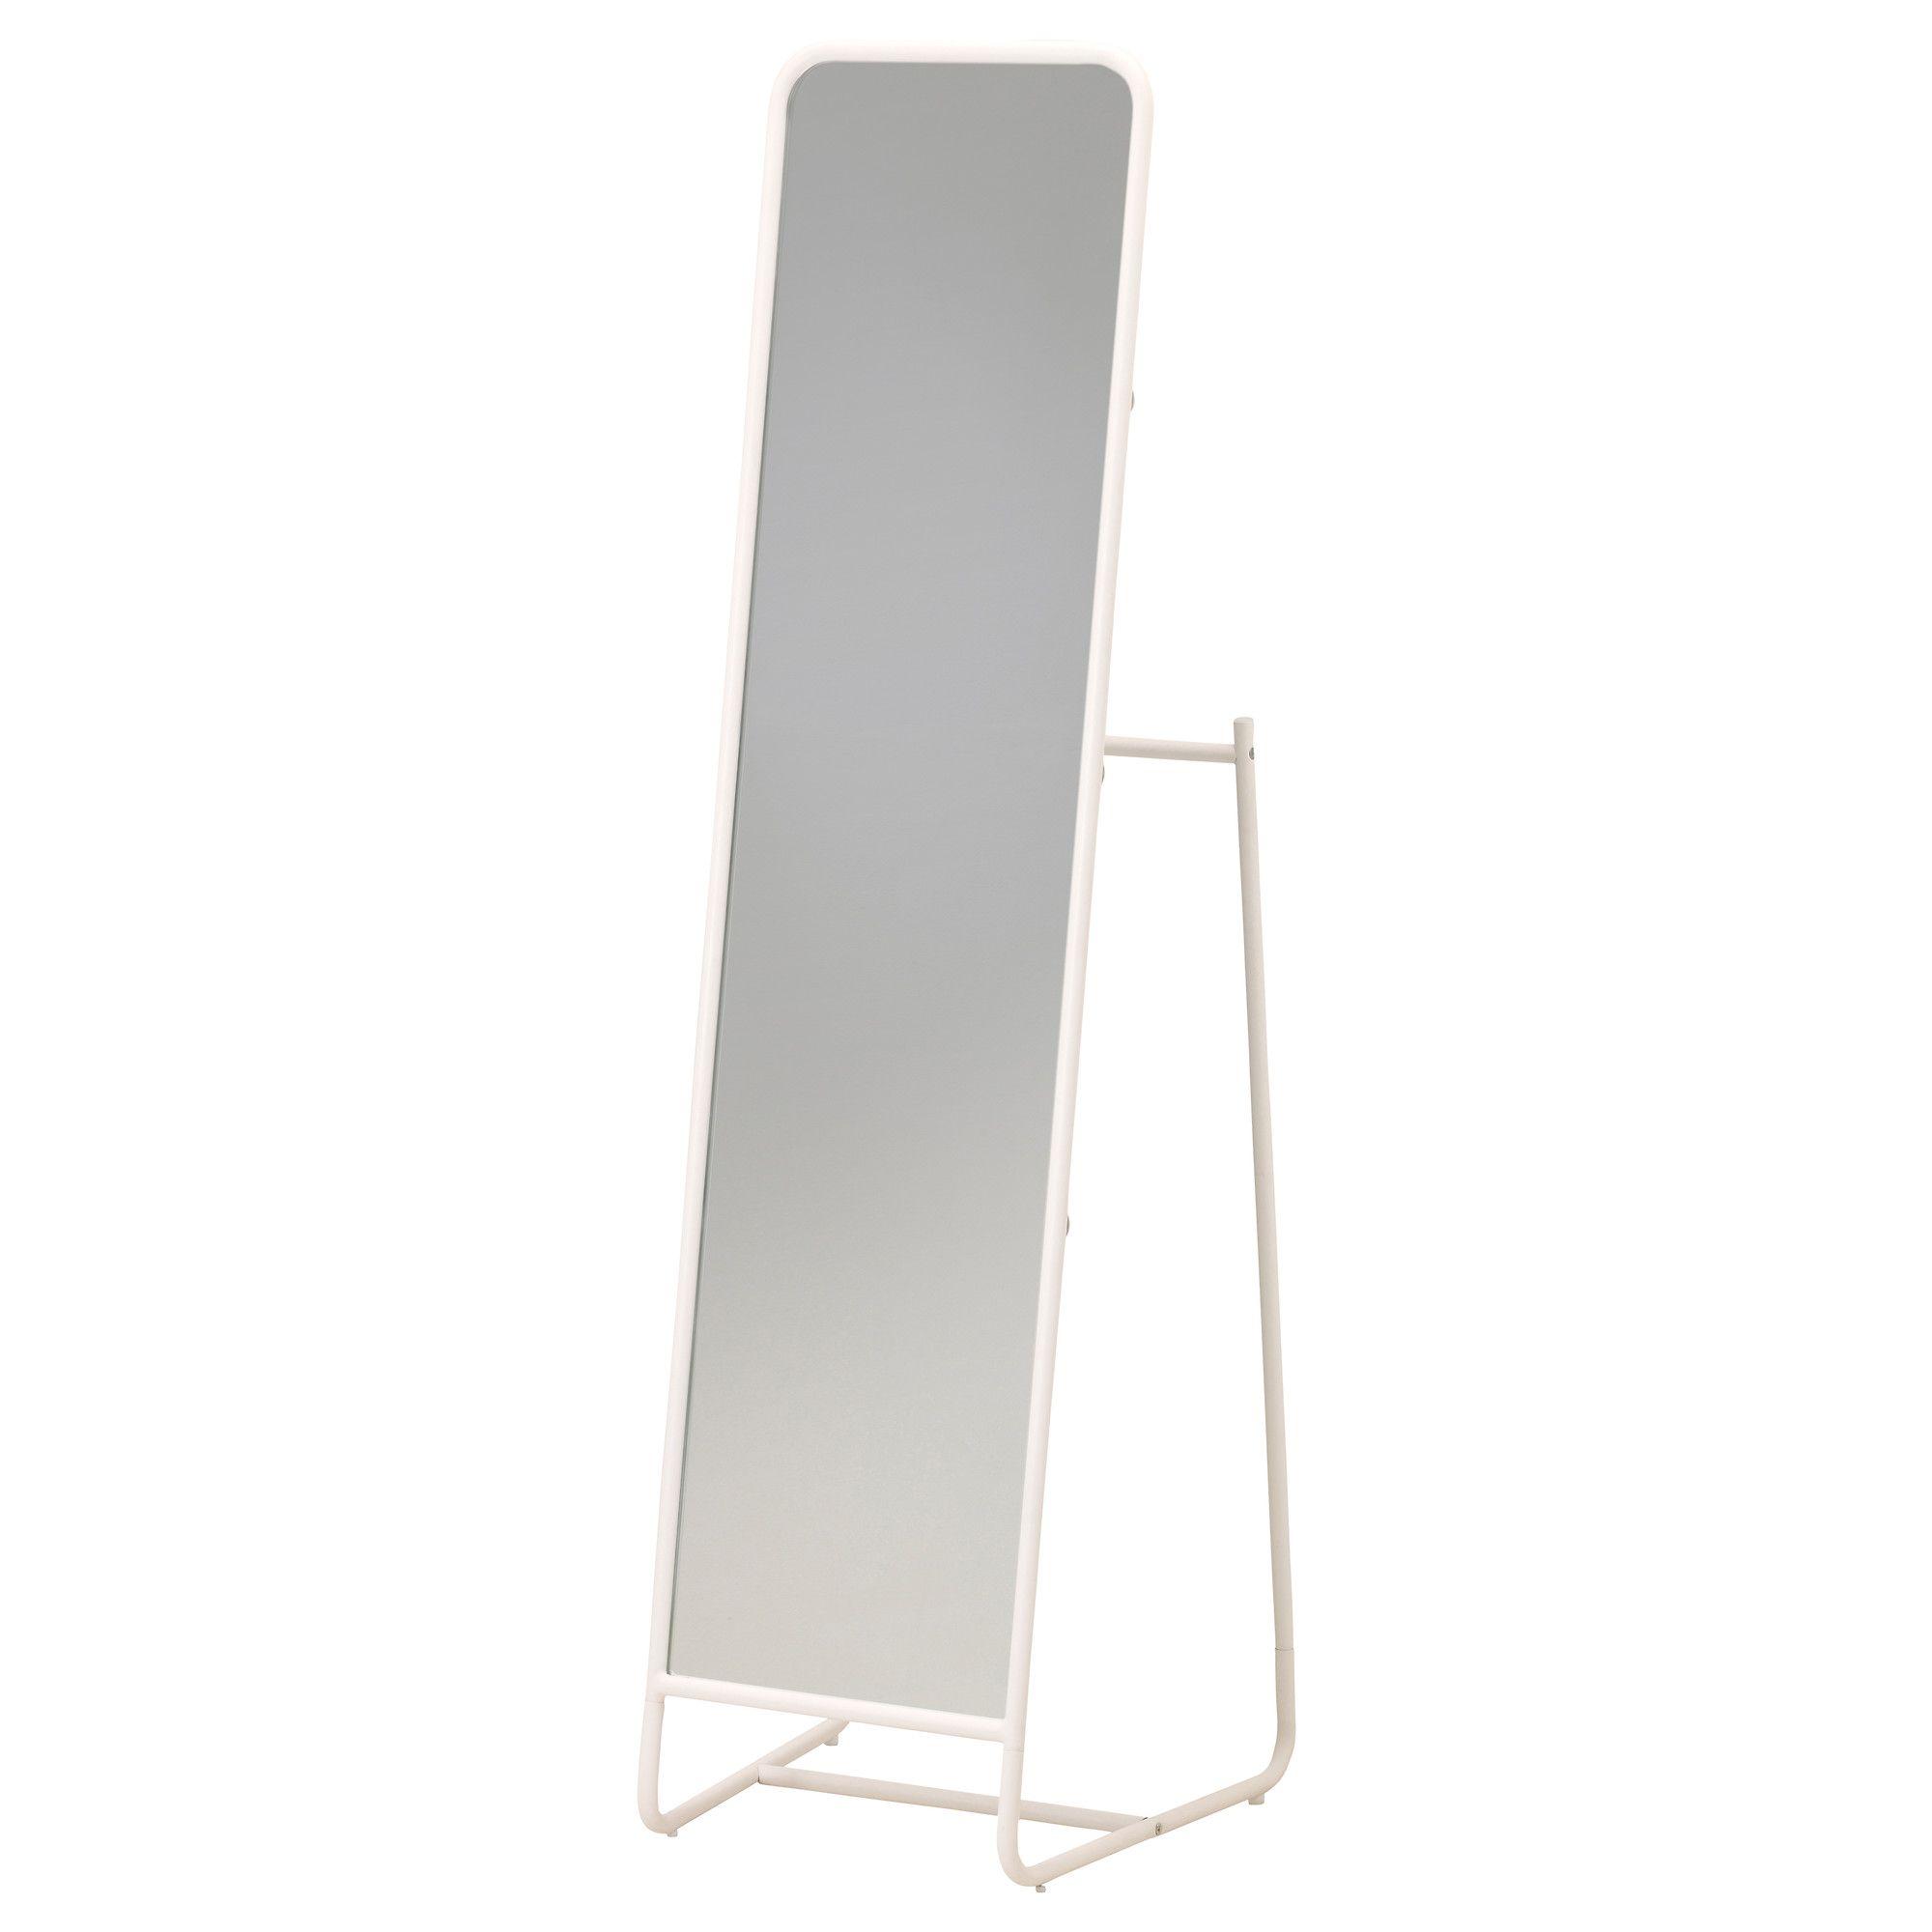 Knapper Specchio Da Terra Ikea Ideas For Home Ikea Espejo De